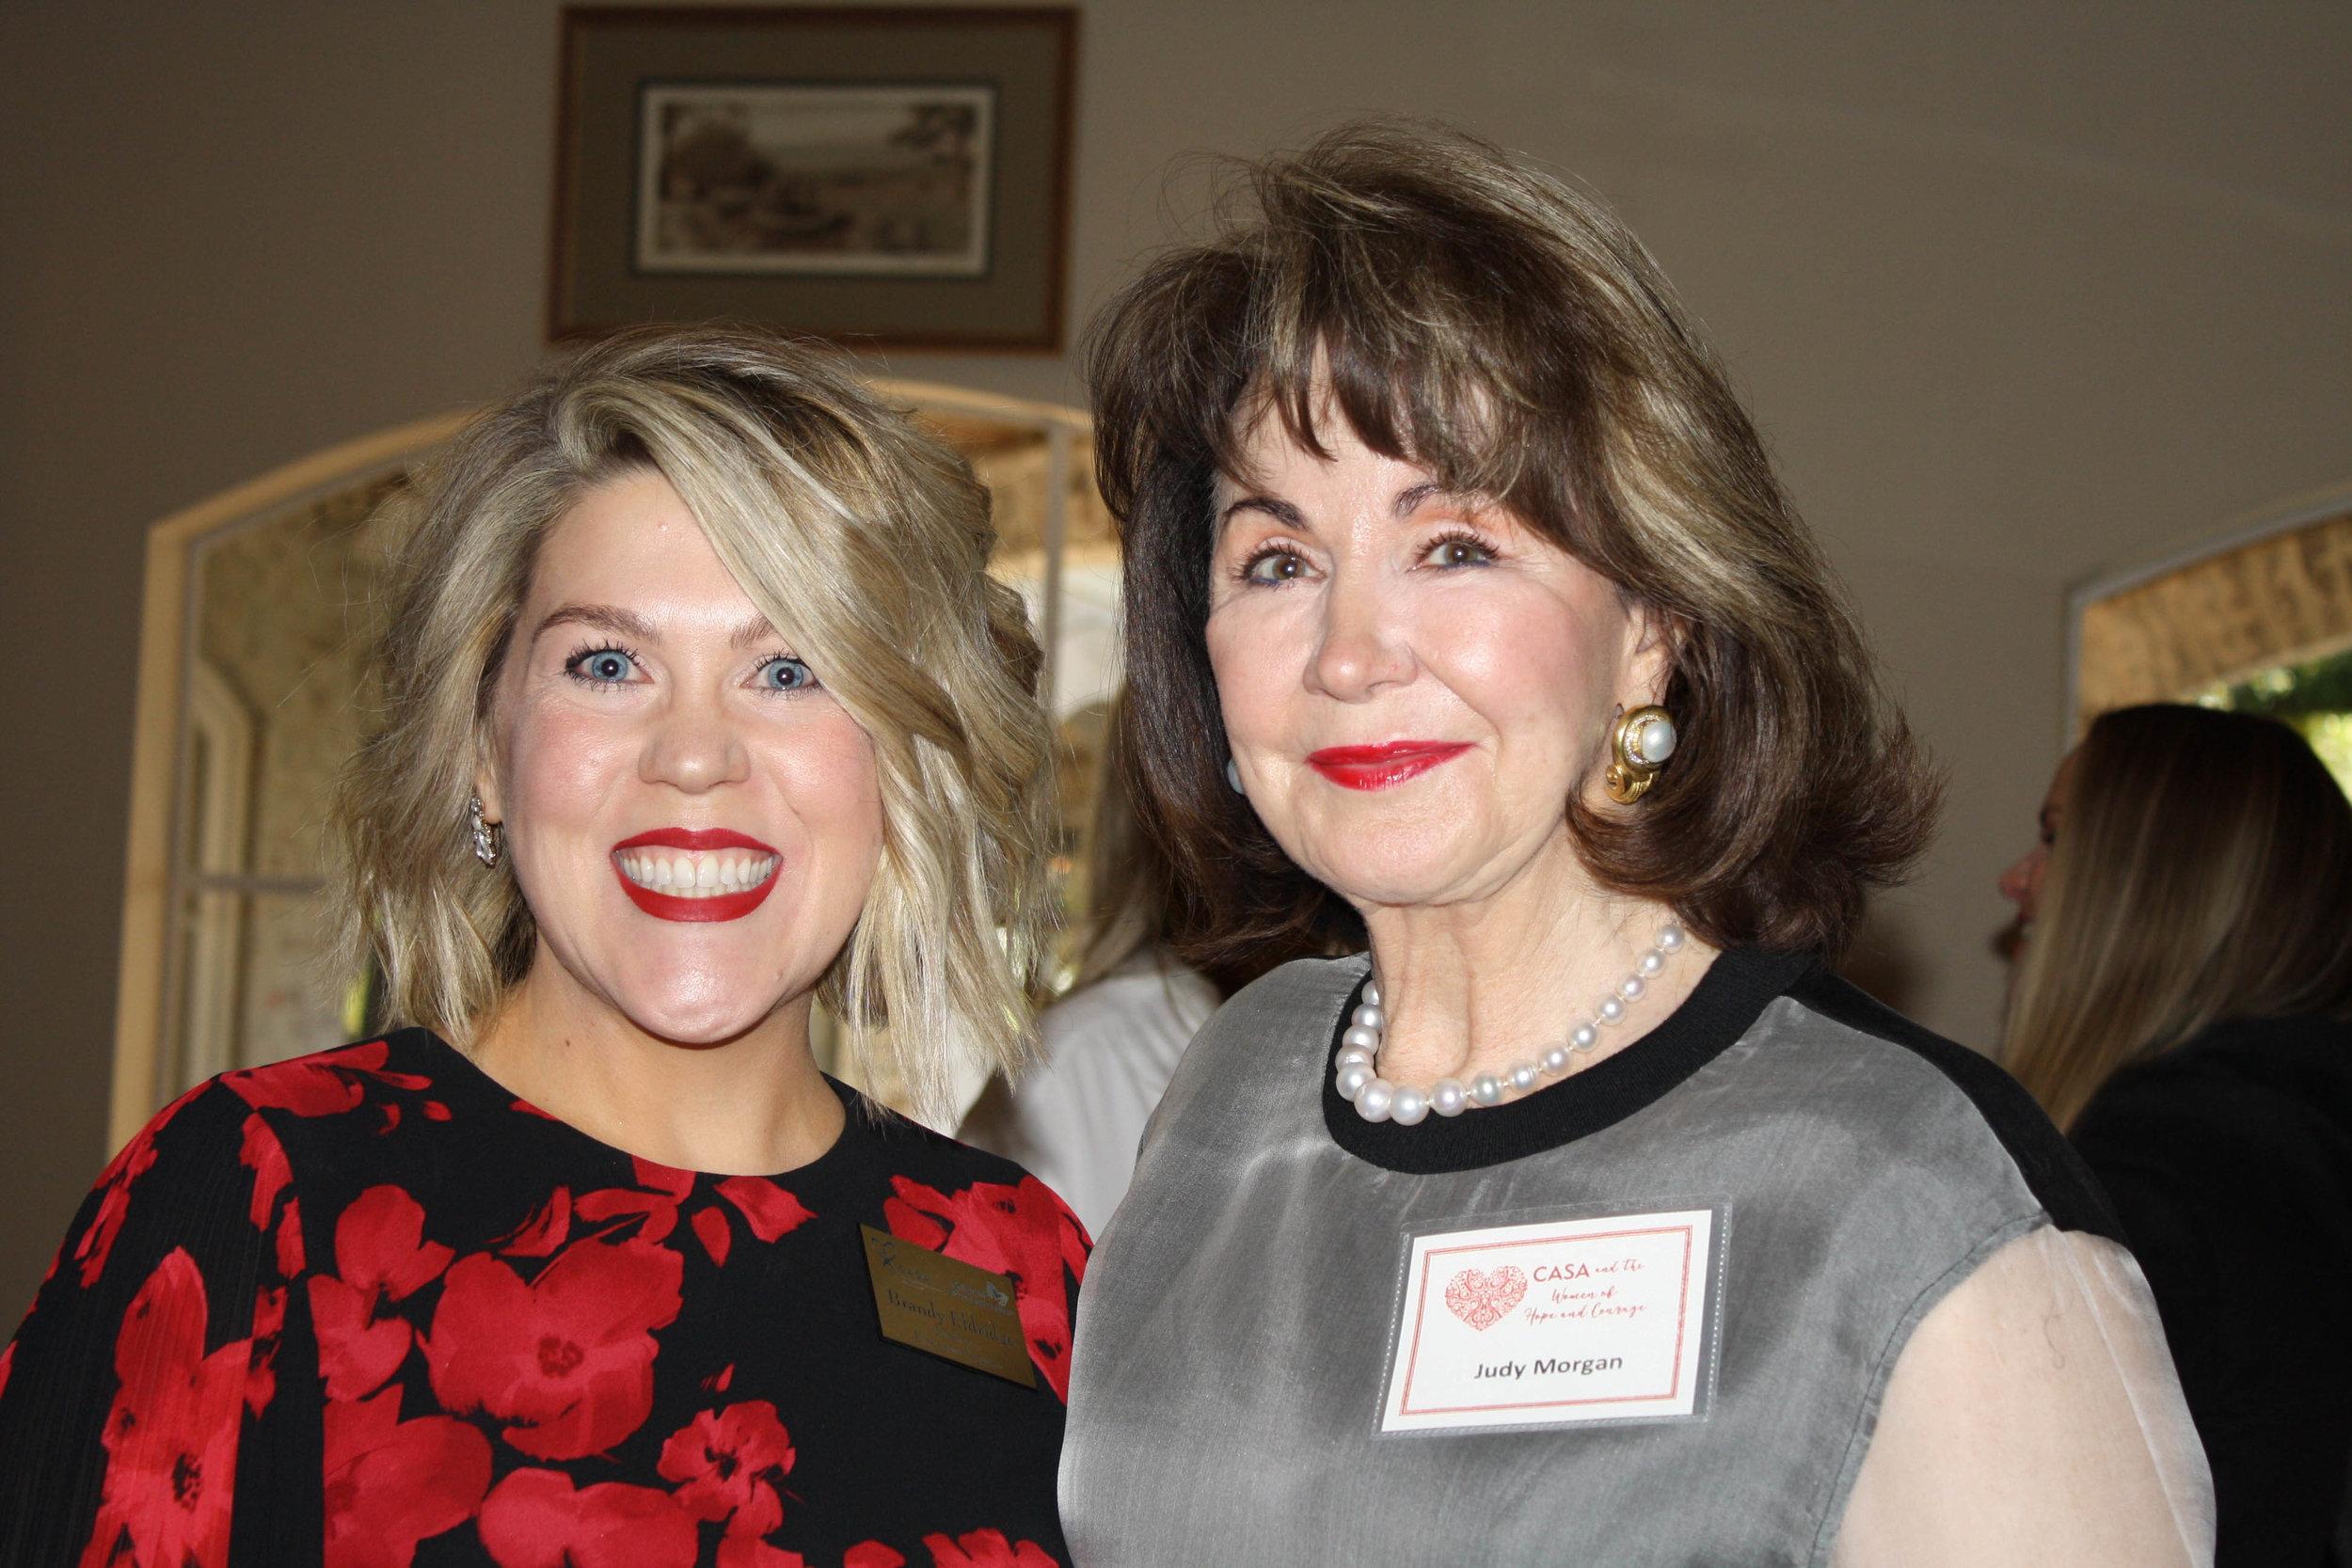 Brandy Eldridge and Judy Morgan